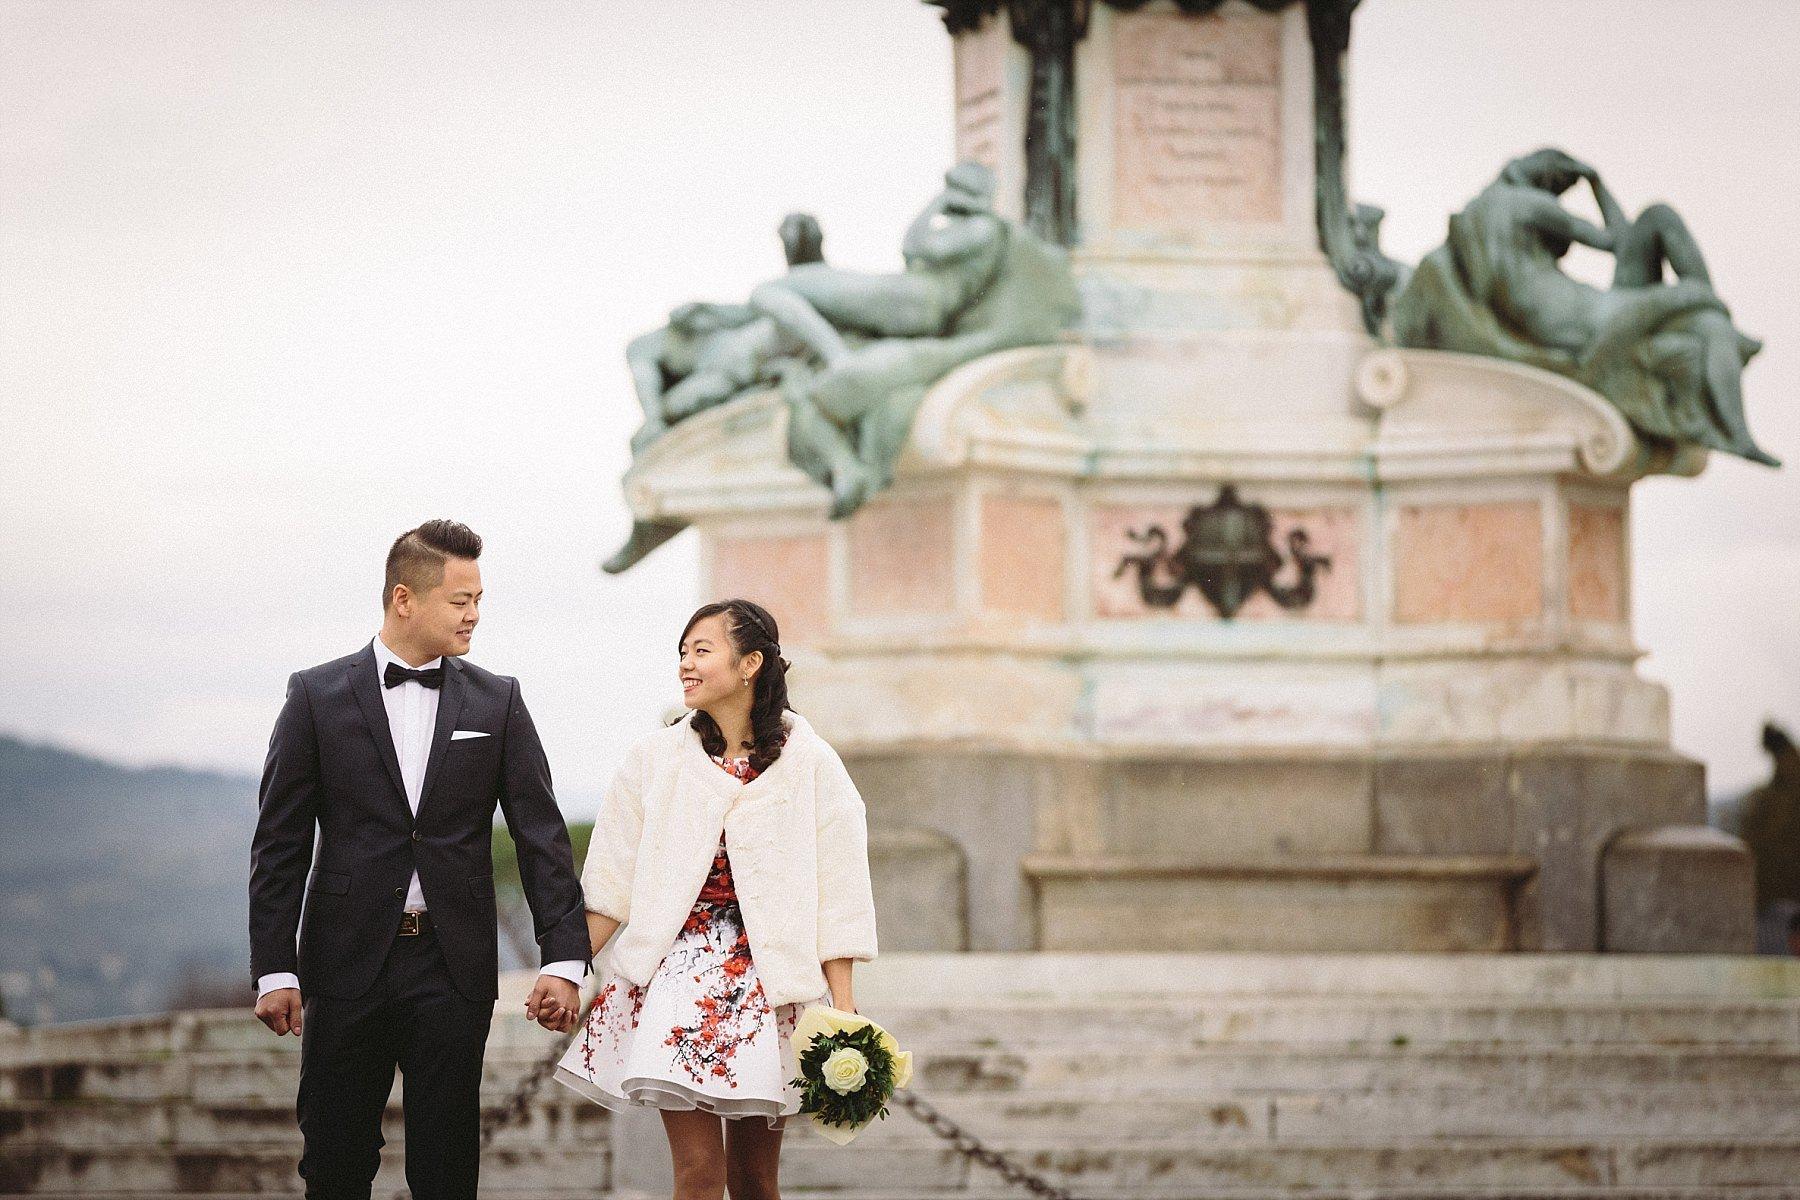 fotografo di matrimoni a firenze four seasons 04 1